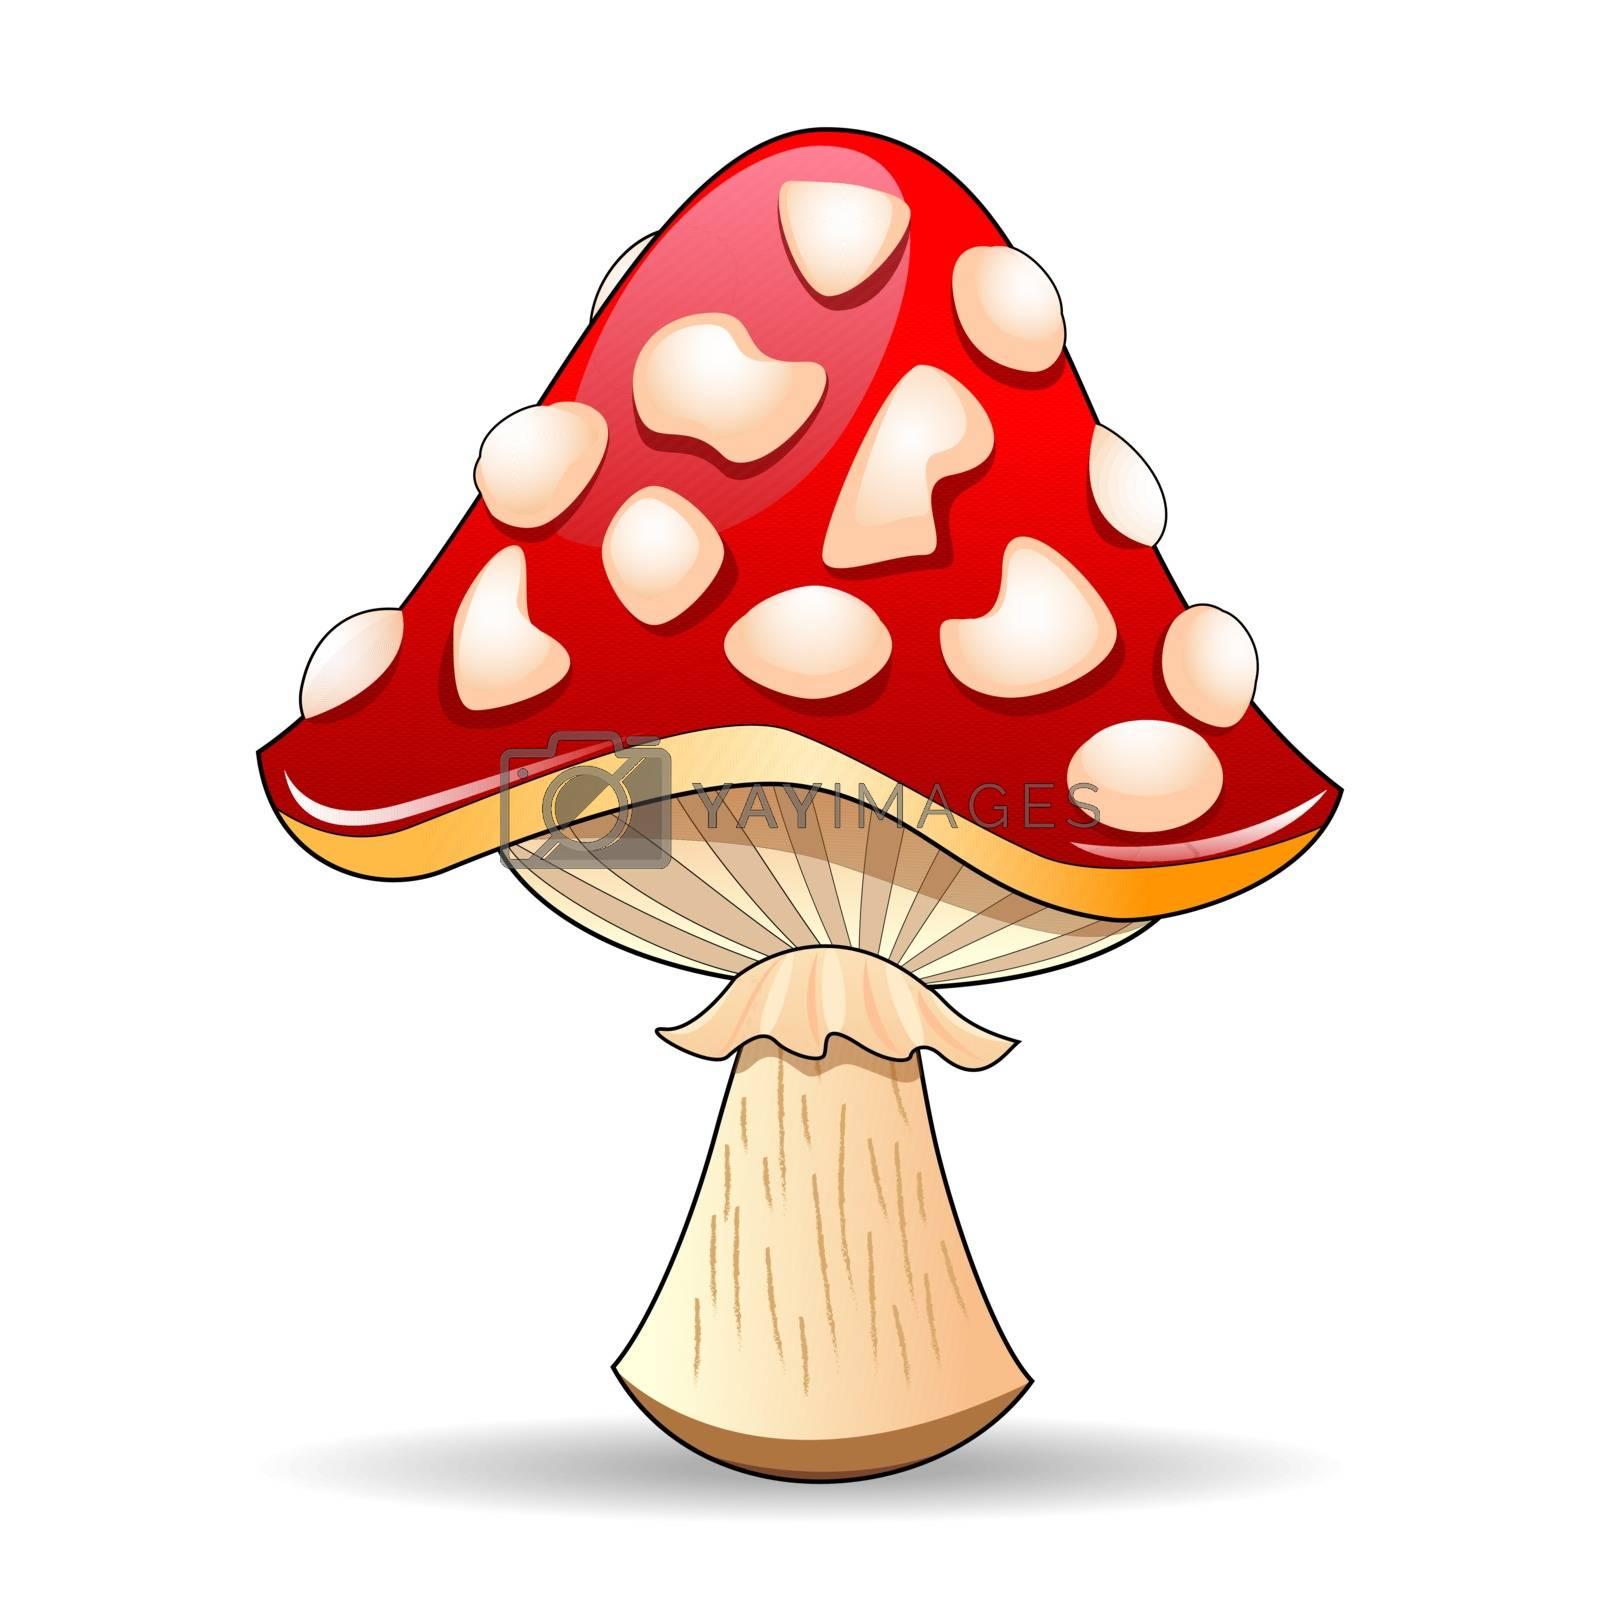 Mushroom by liolle